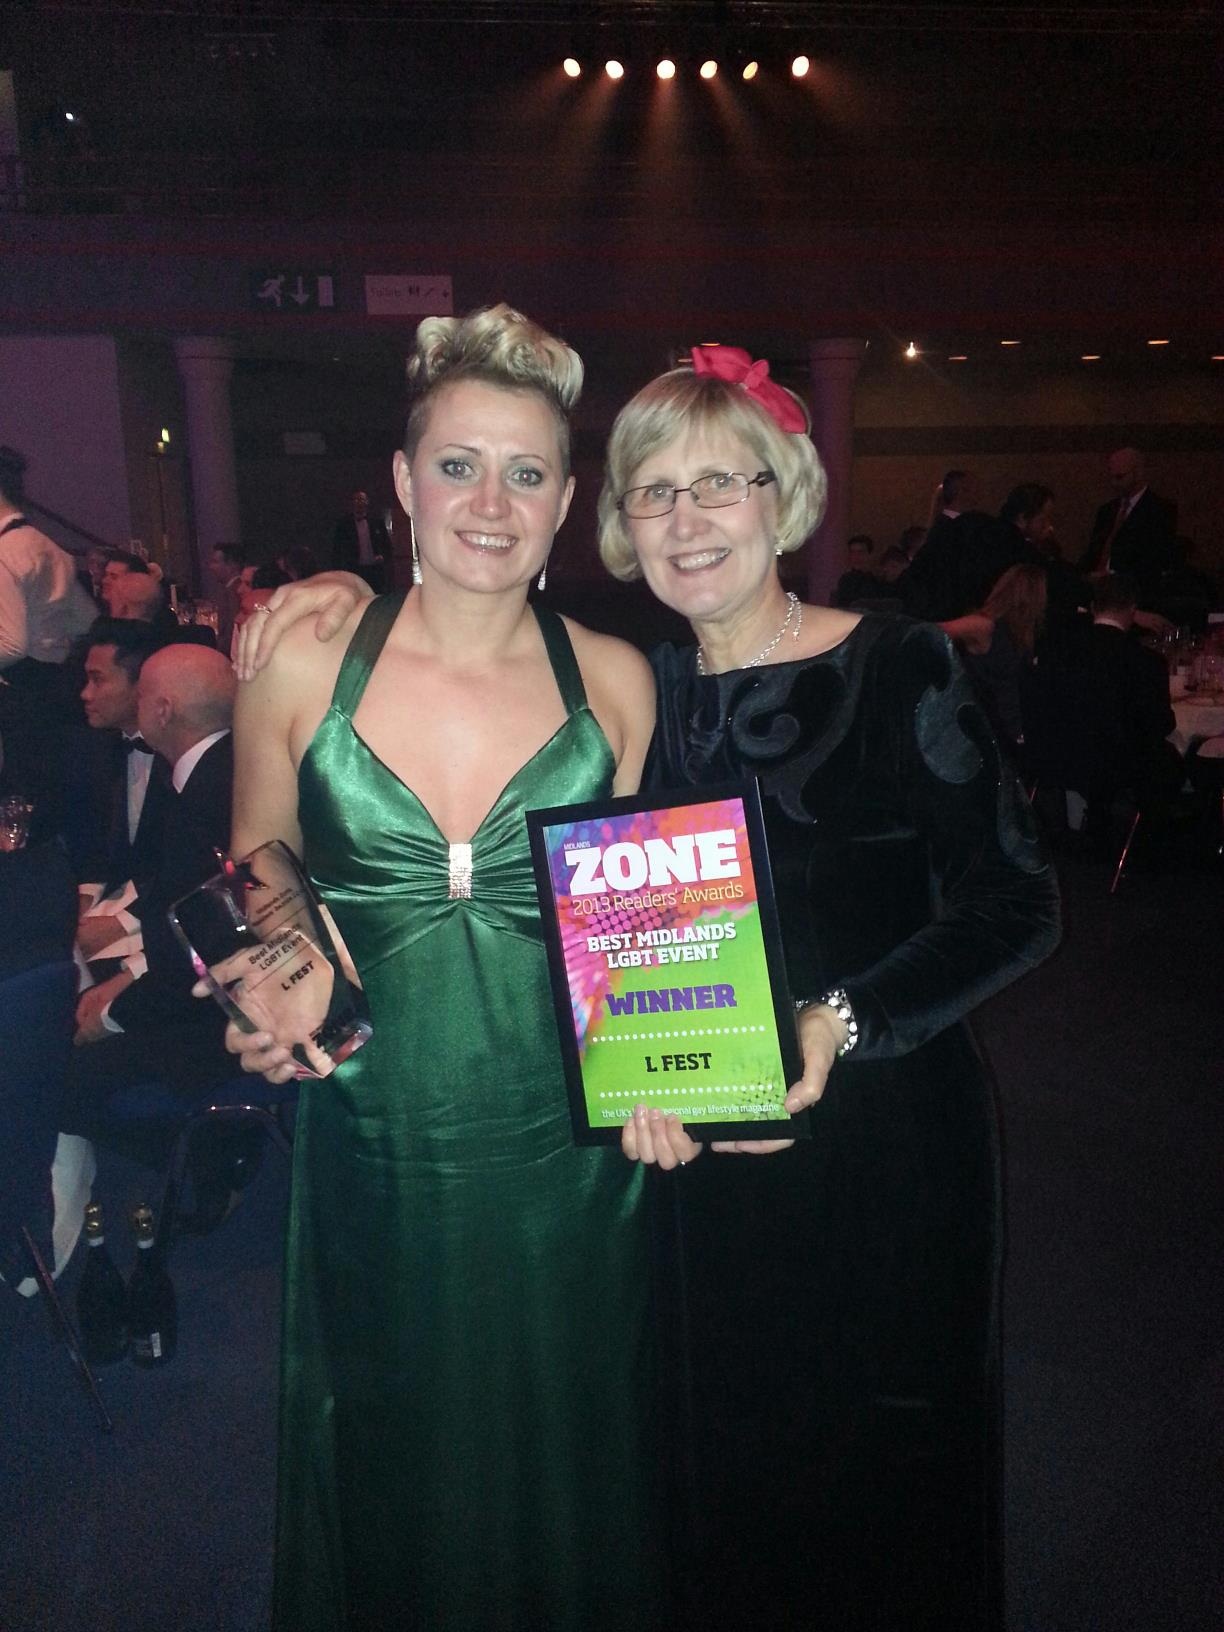 Me & Mum with the Midland Zone Award